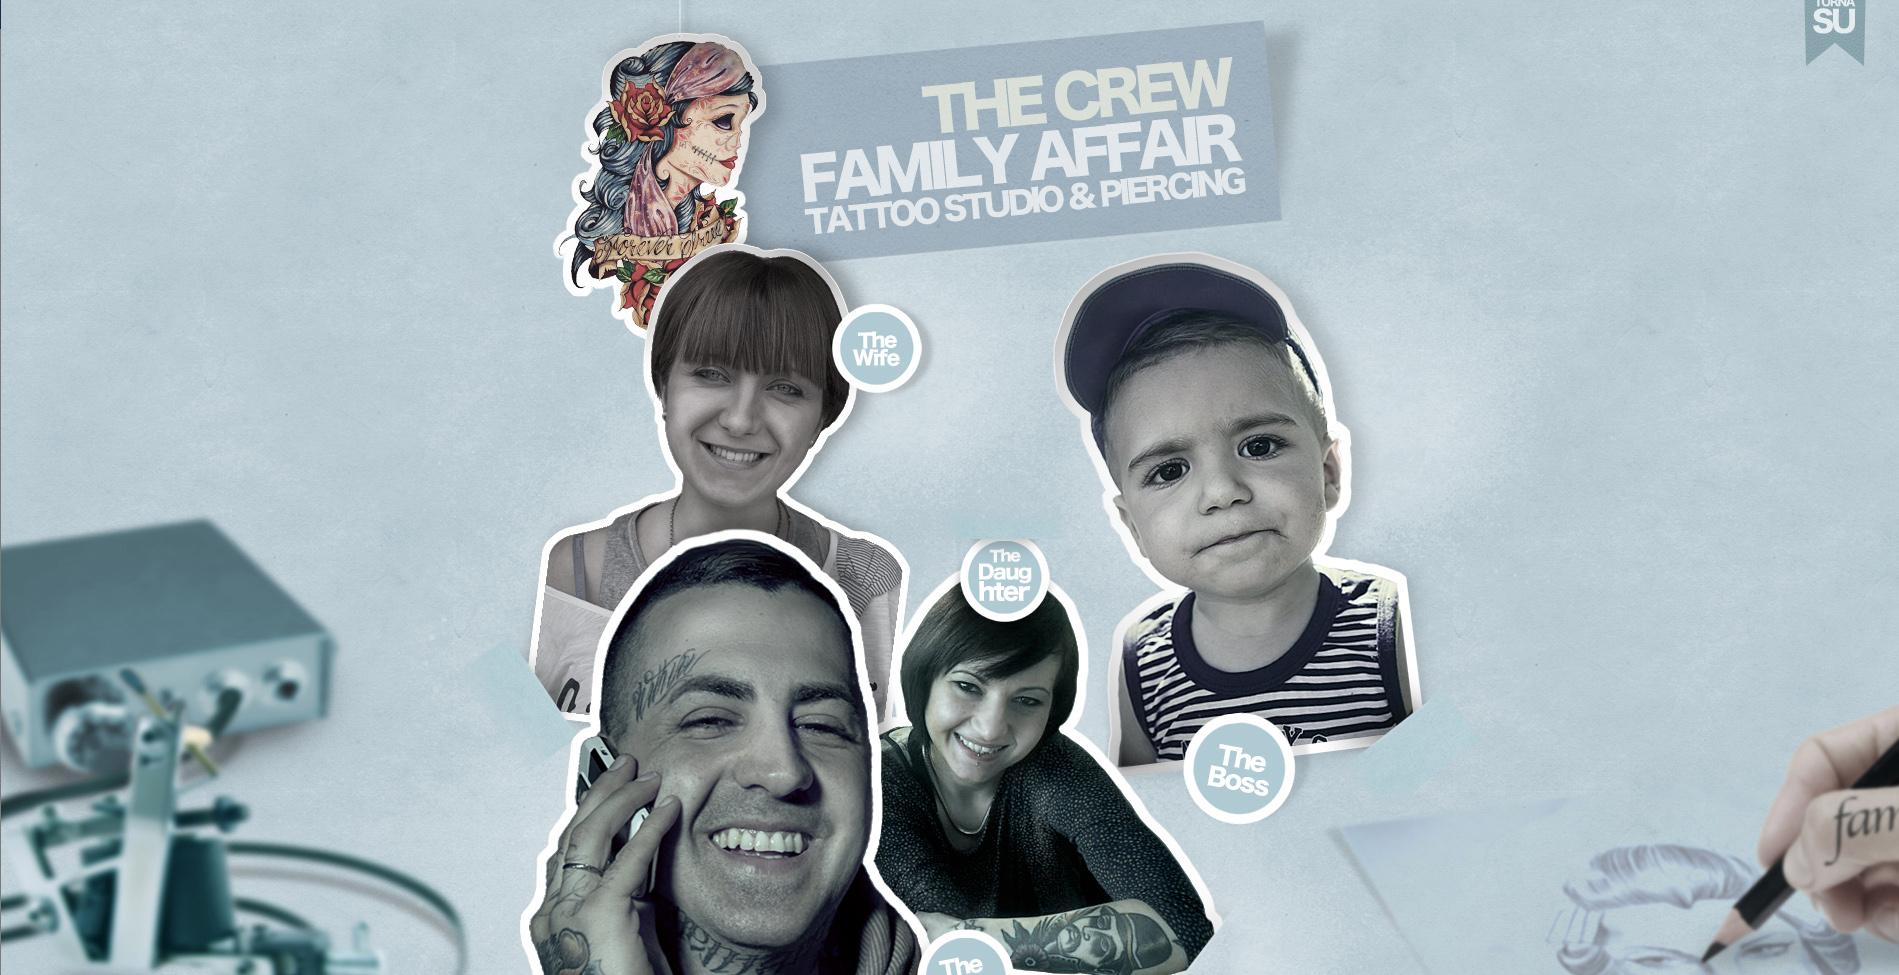 Family Affair Tattoo Studio & Piercing Website Screenshot